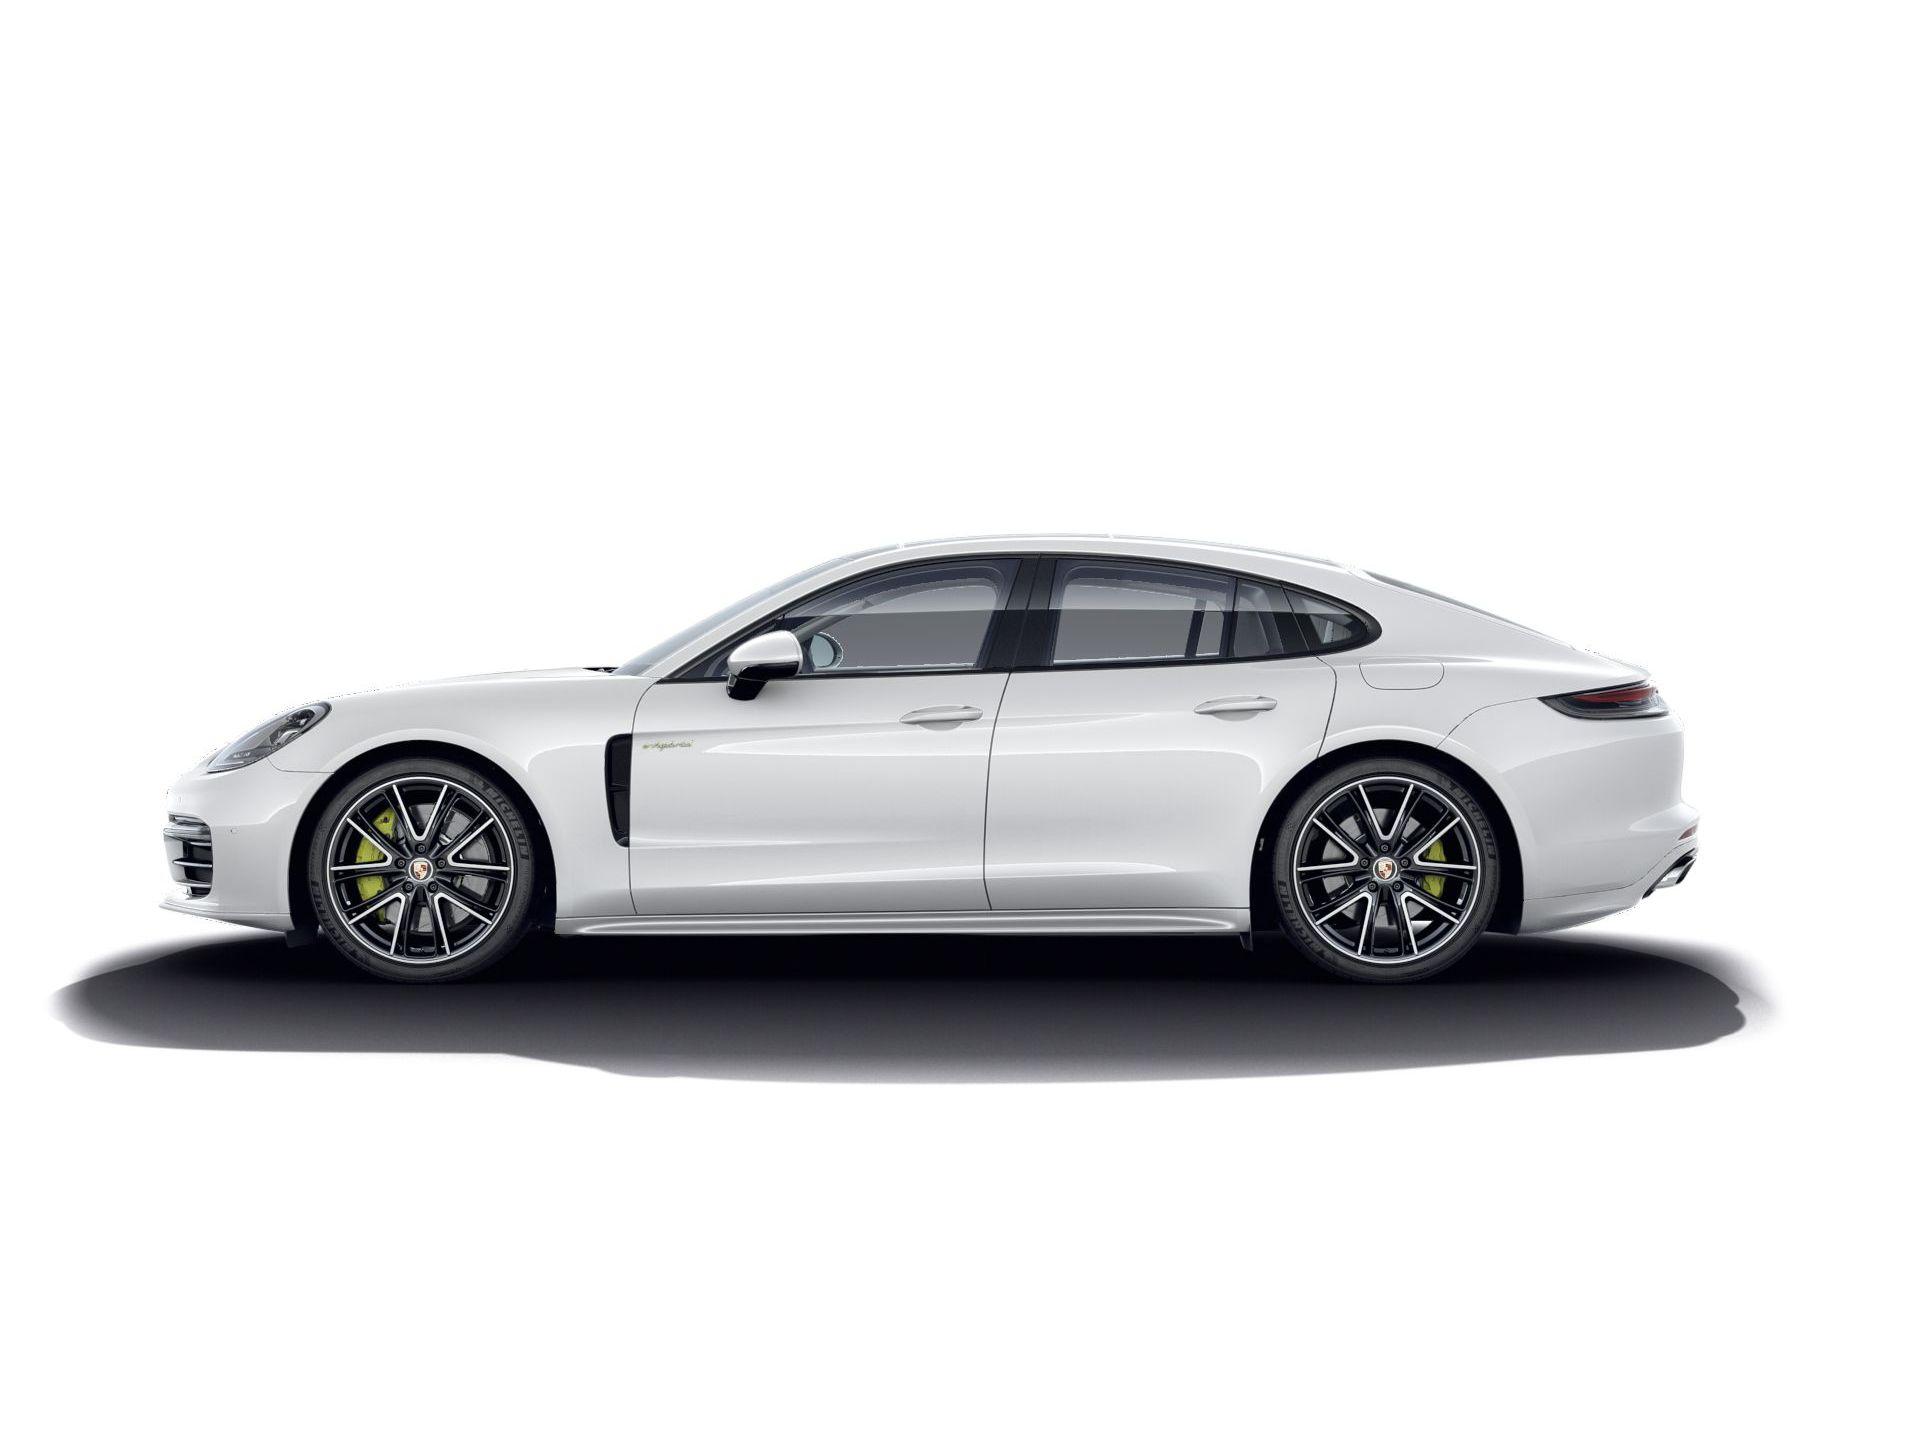 2021 Porsche Panamera 4 E-Hybrid – 2